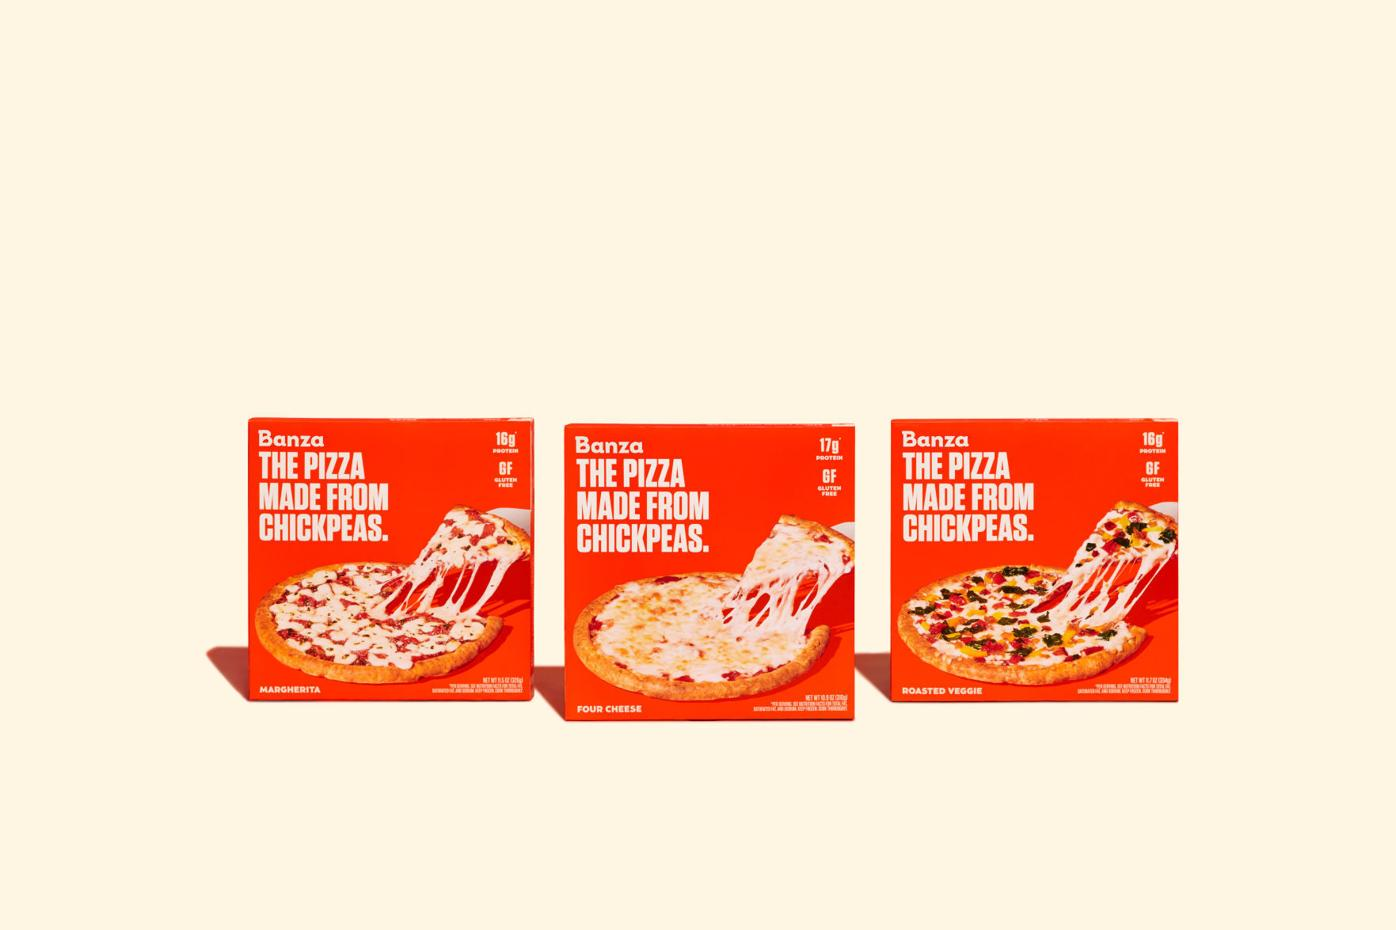 Banza Pizza packaging